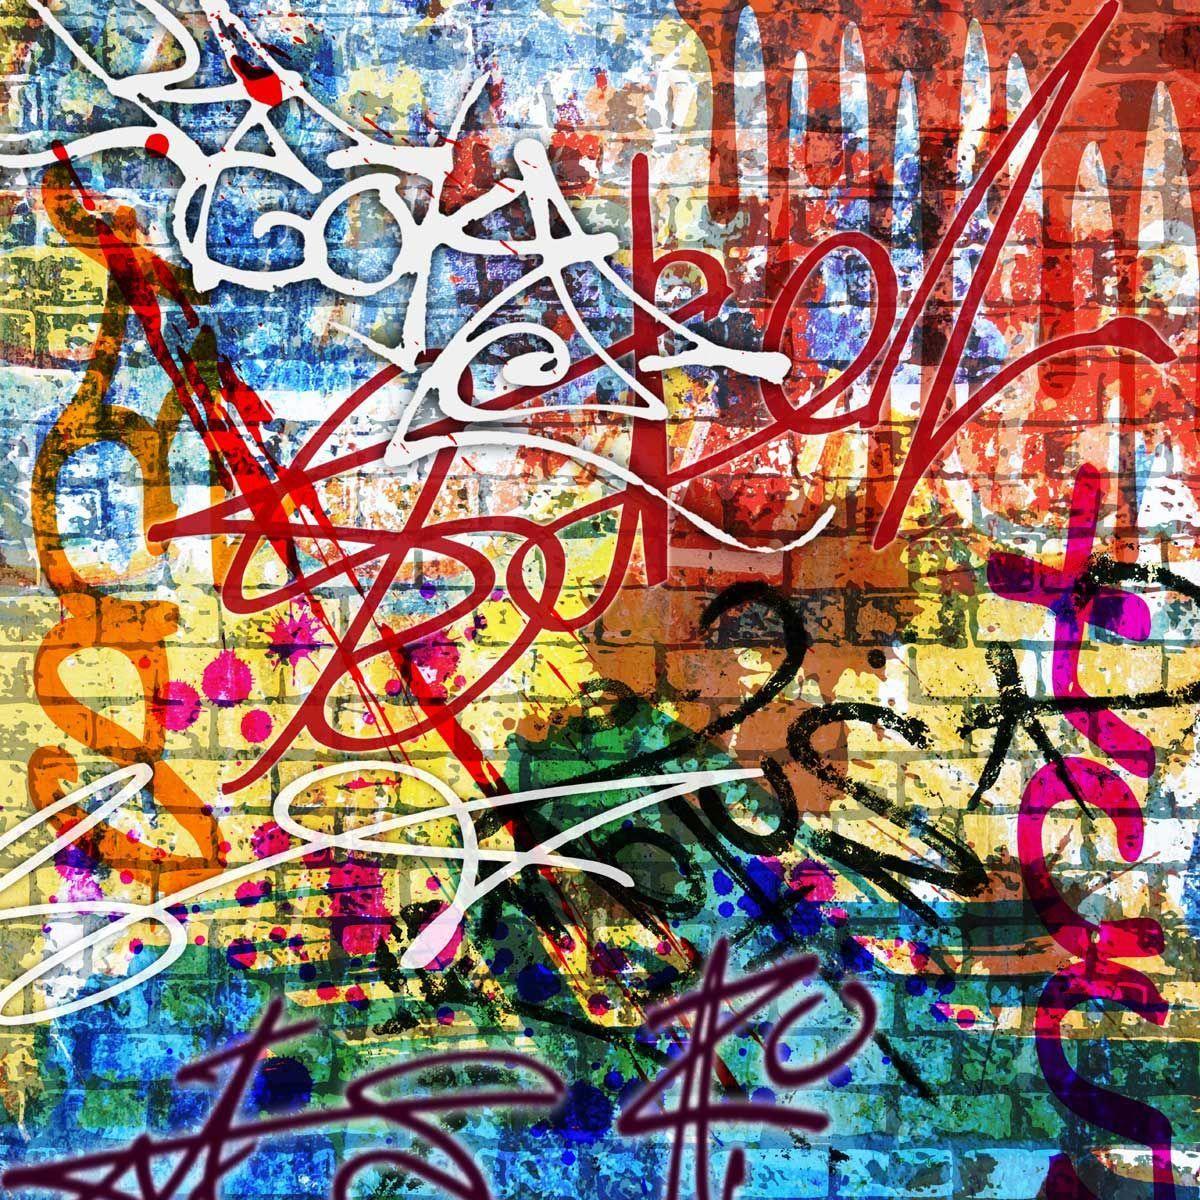 Brick Wall Graffiti Wallpaper Mural By Loveabode Com Wallpapermuralspillows Graffiti Wallpaper Mural Wallpaper Graffiti